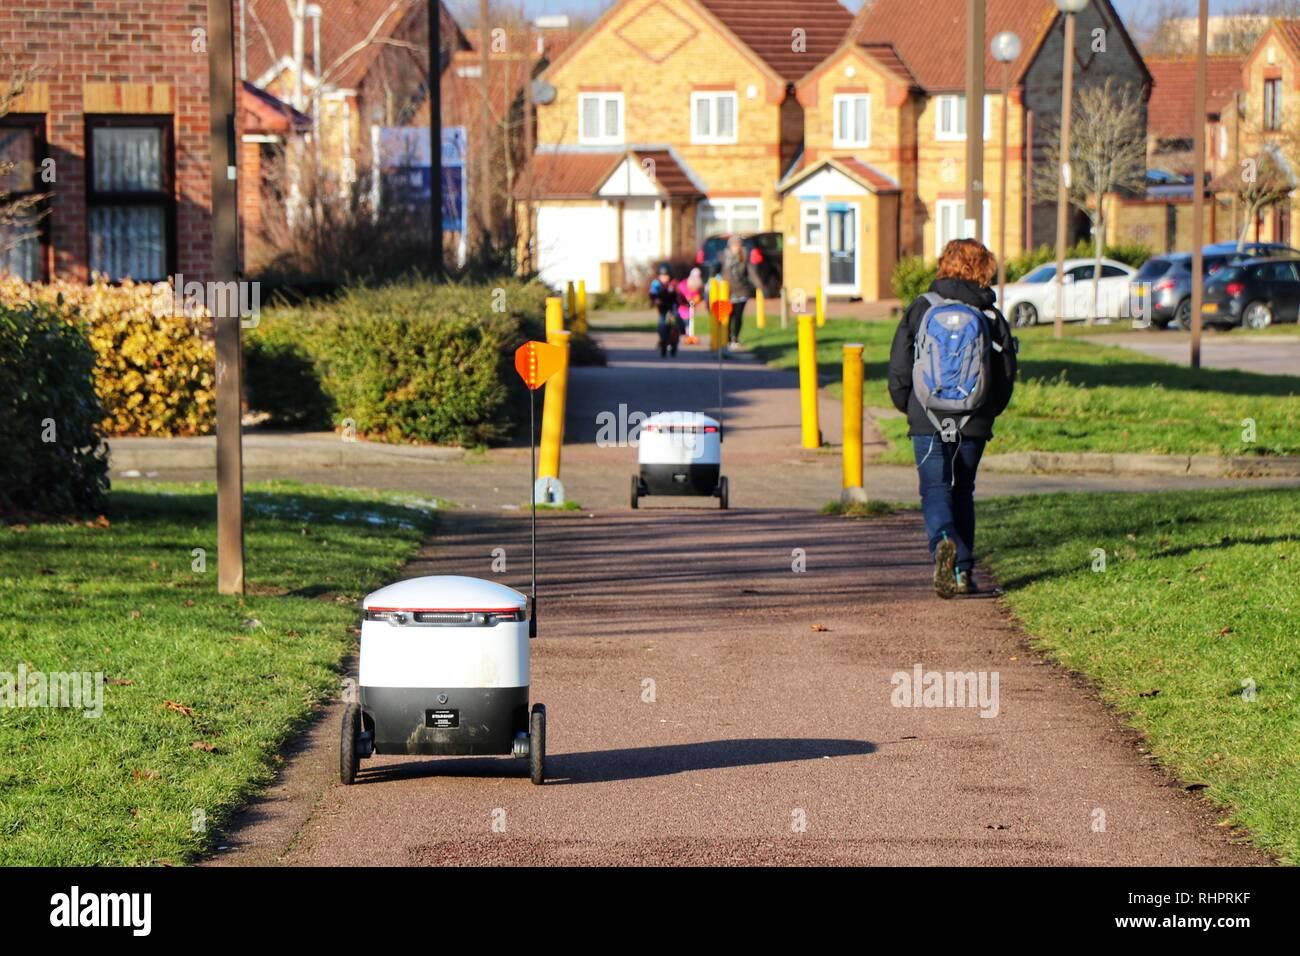 Pedestrians go about their daily lives as Starship Technologies autonomous robots make routine grocery deliveries around Milton Keynes. Stock Photo